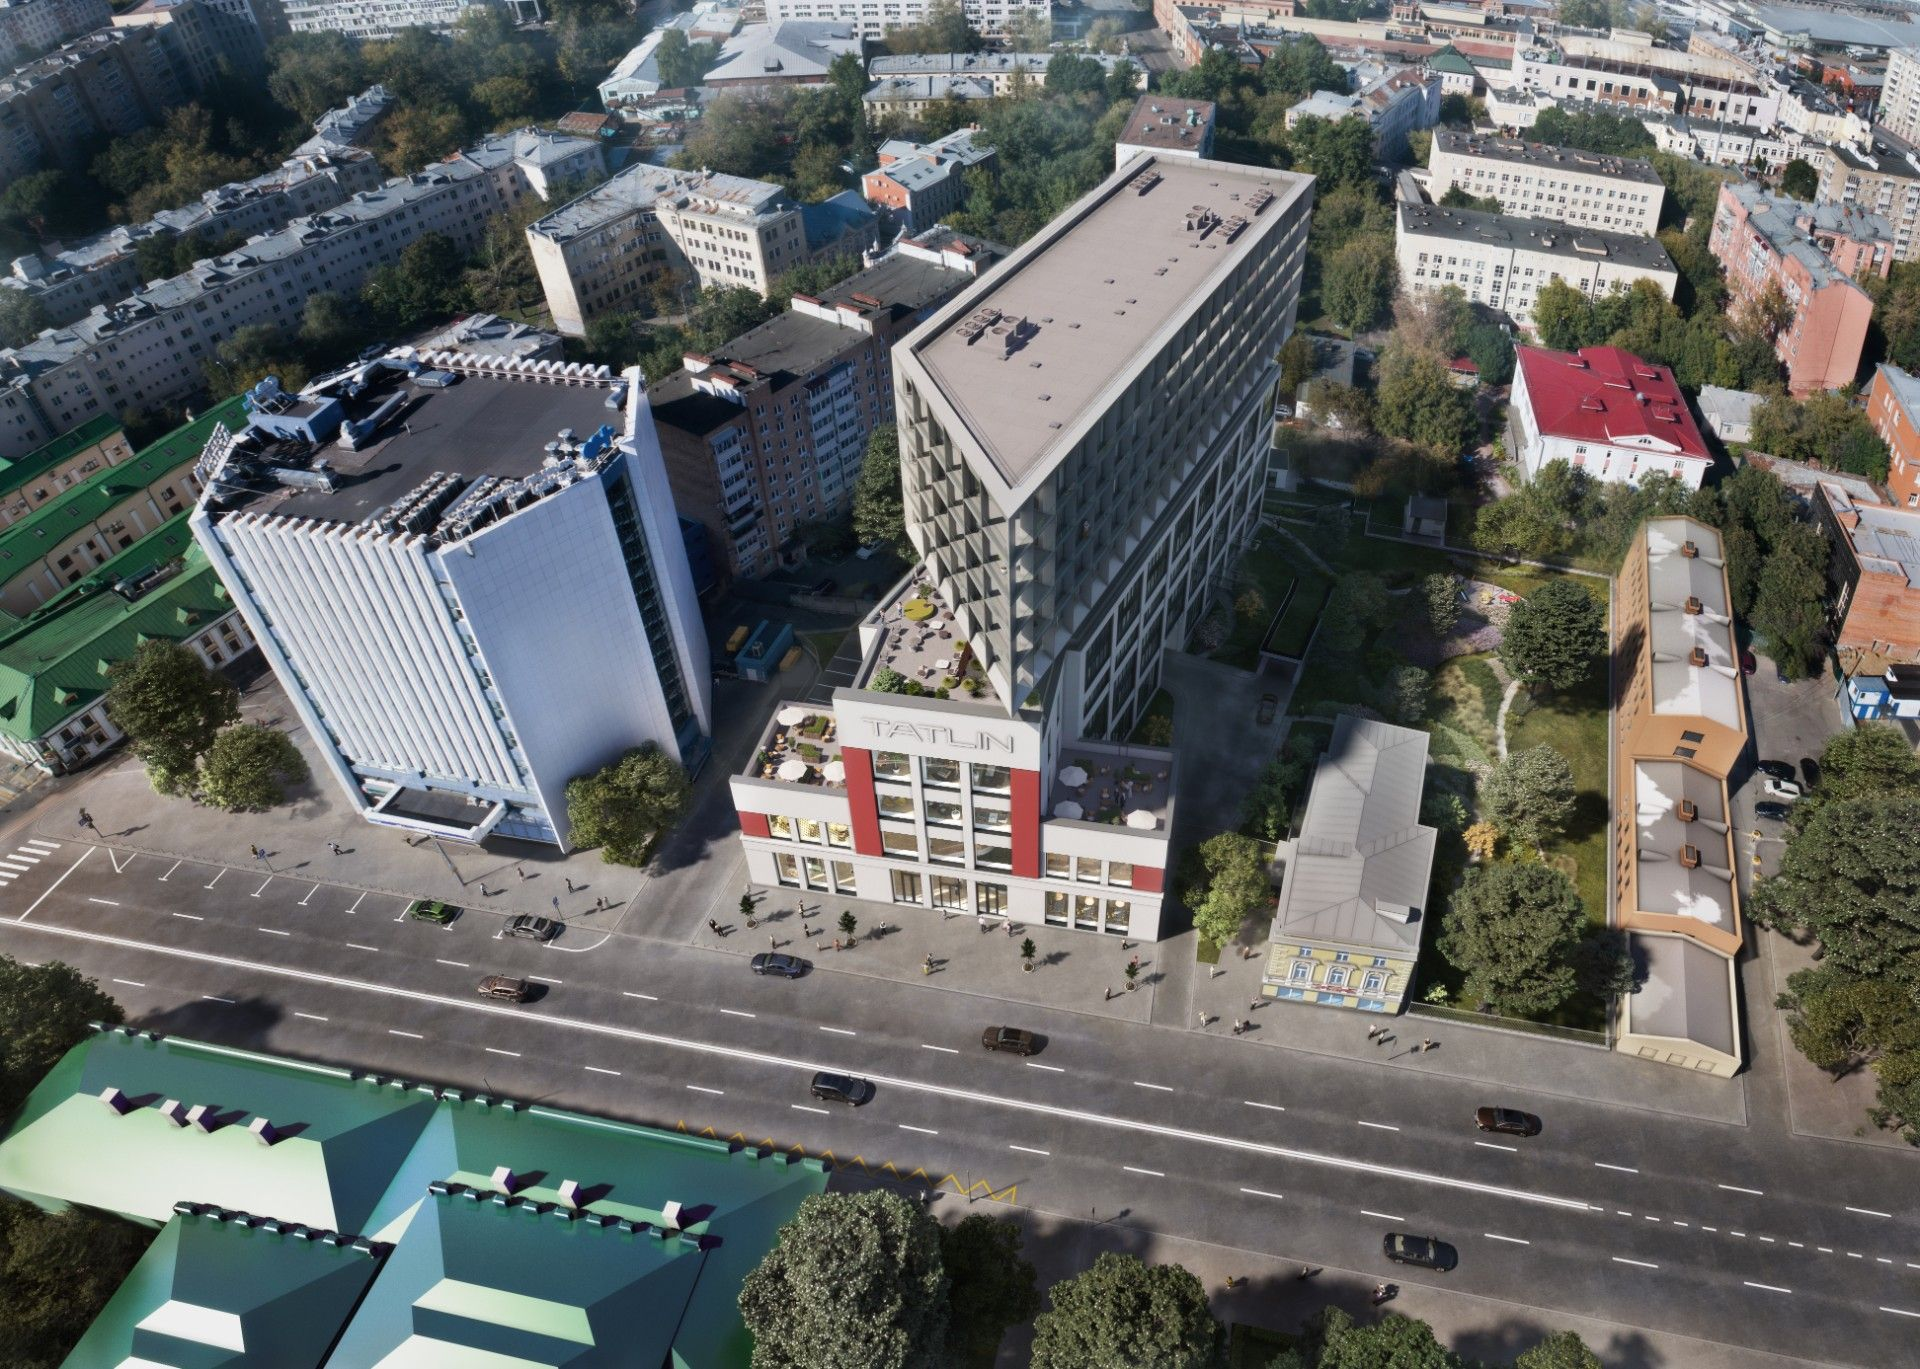 жилой комплекс Tatlin Apartments (Татлин Апартментс)